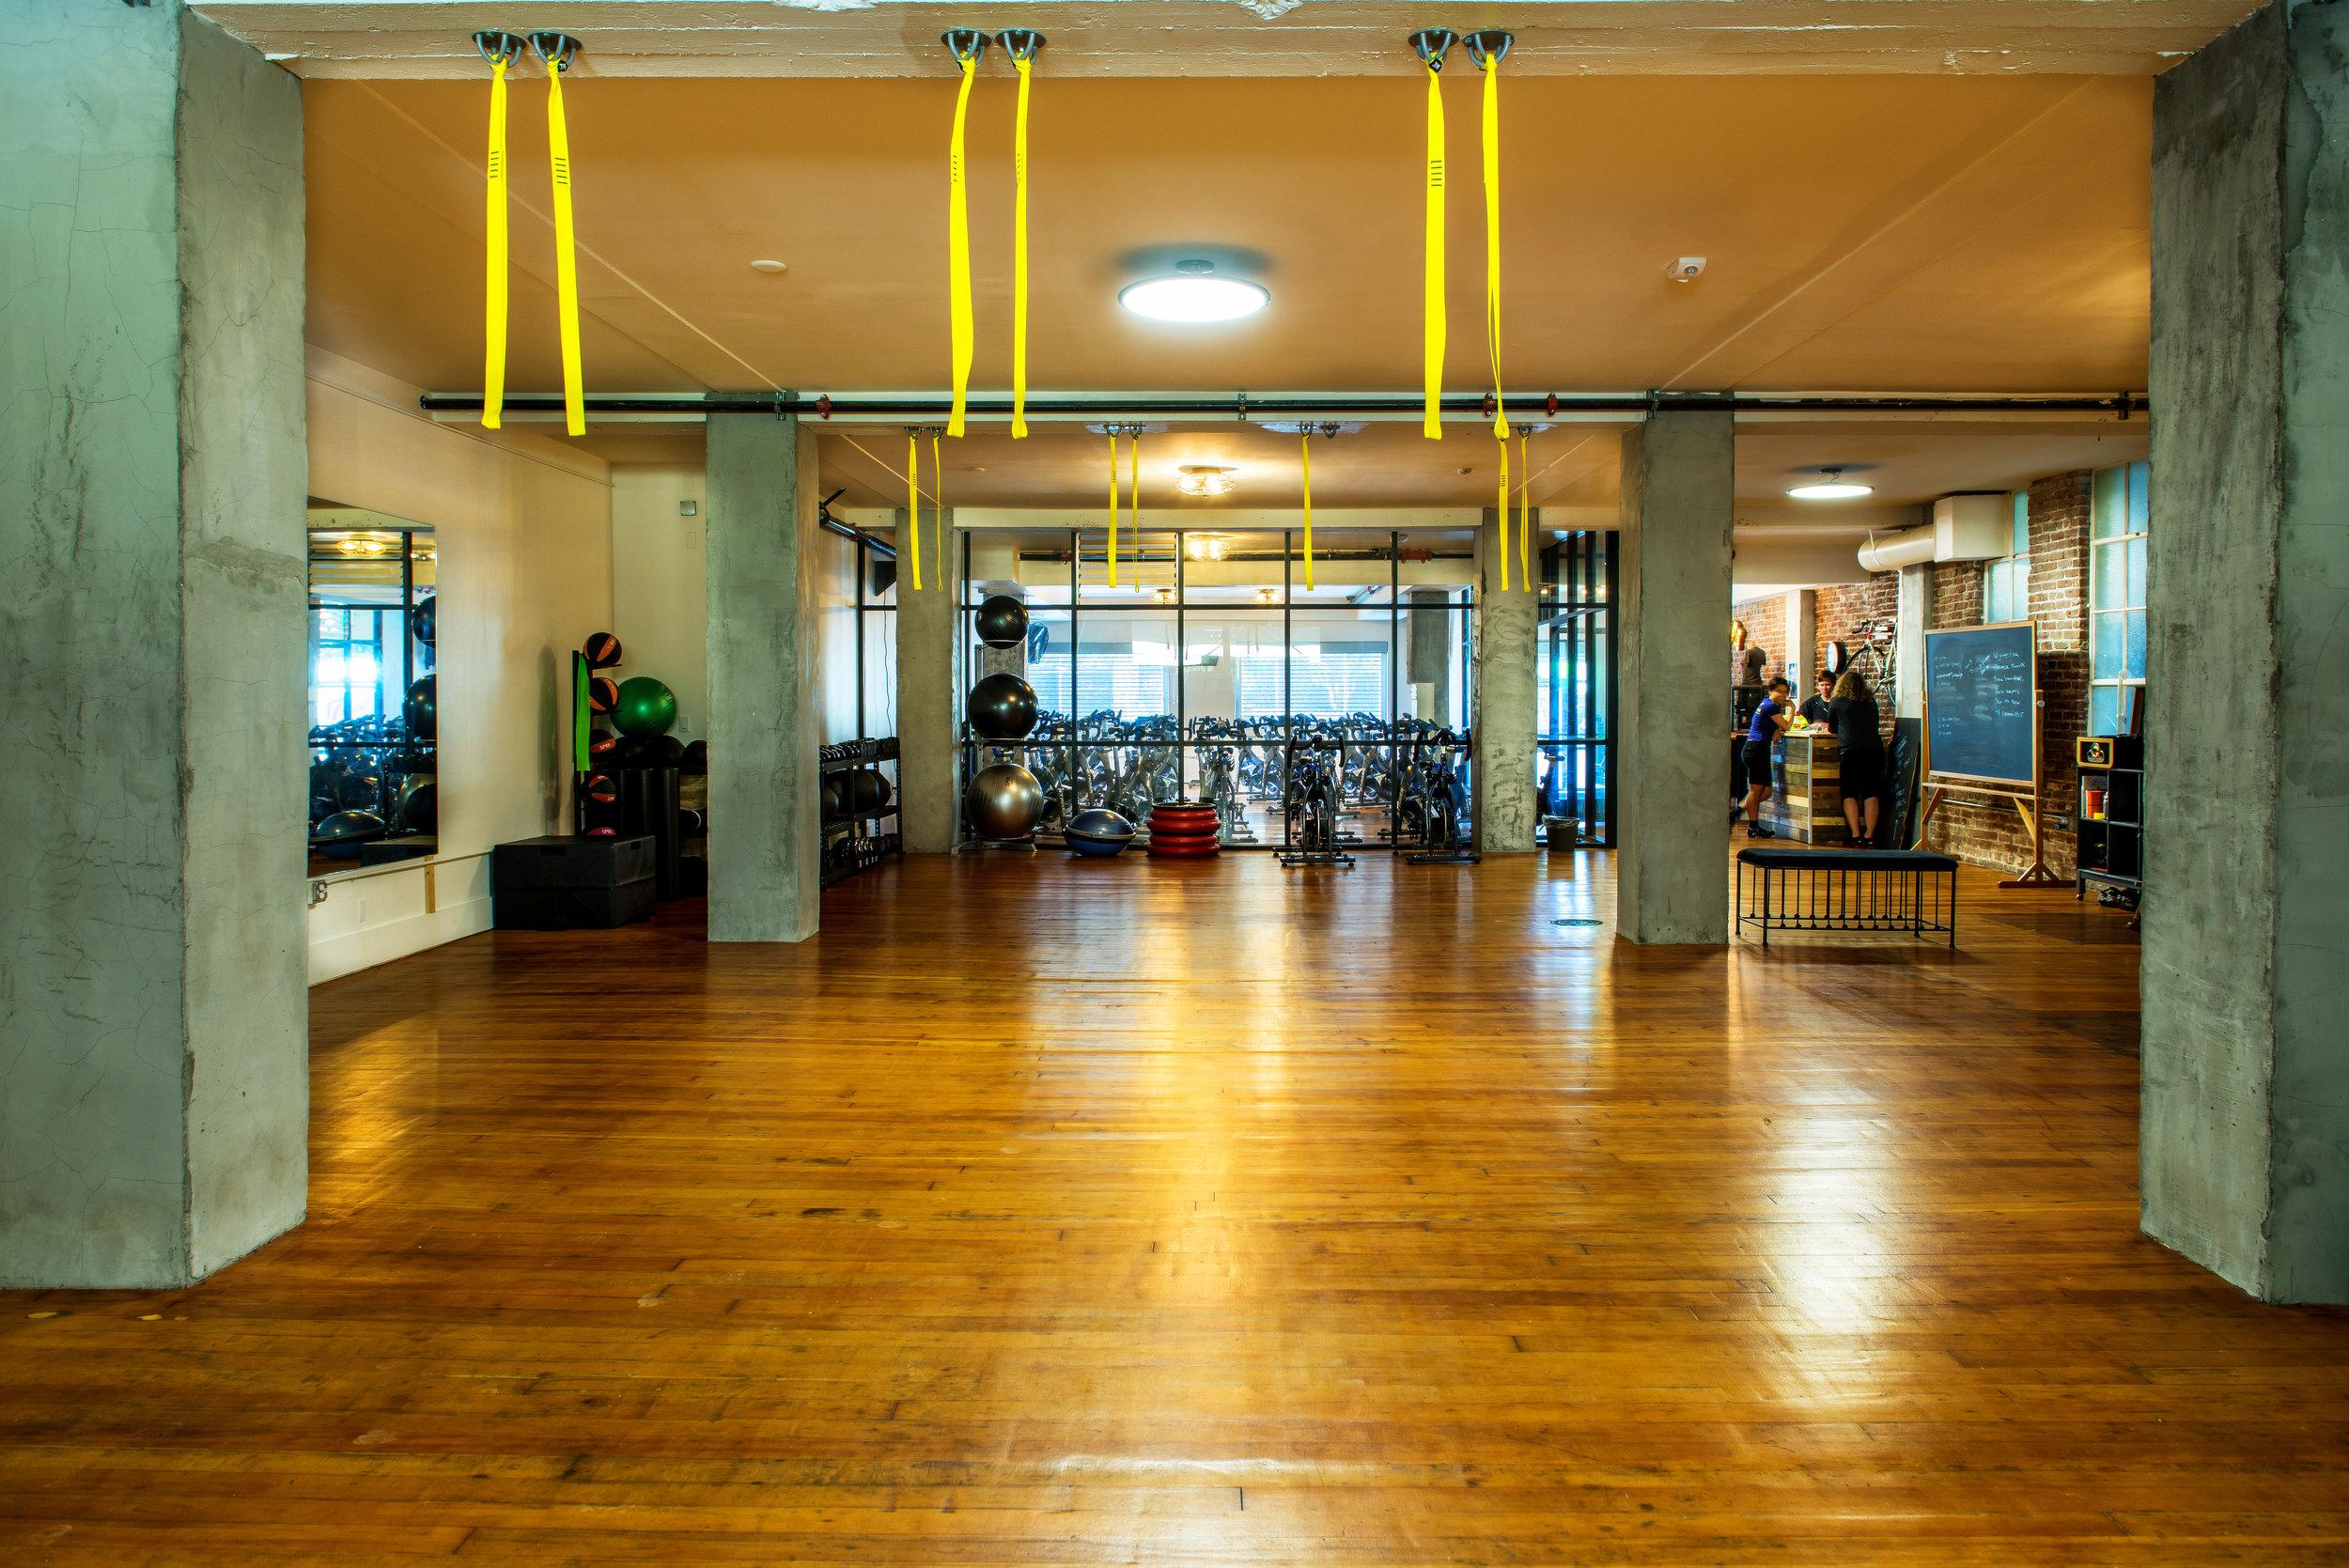 The TRx and strength training gym